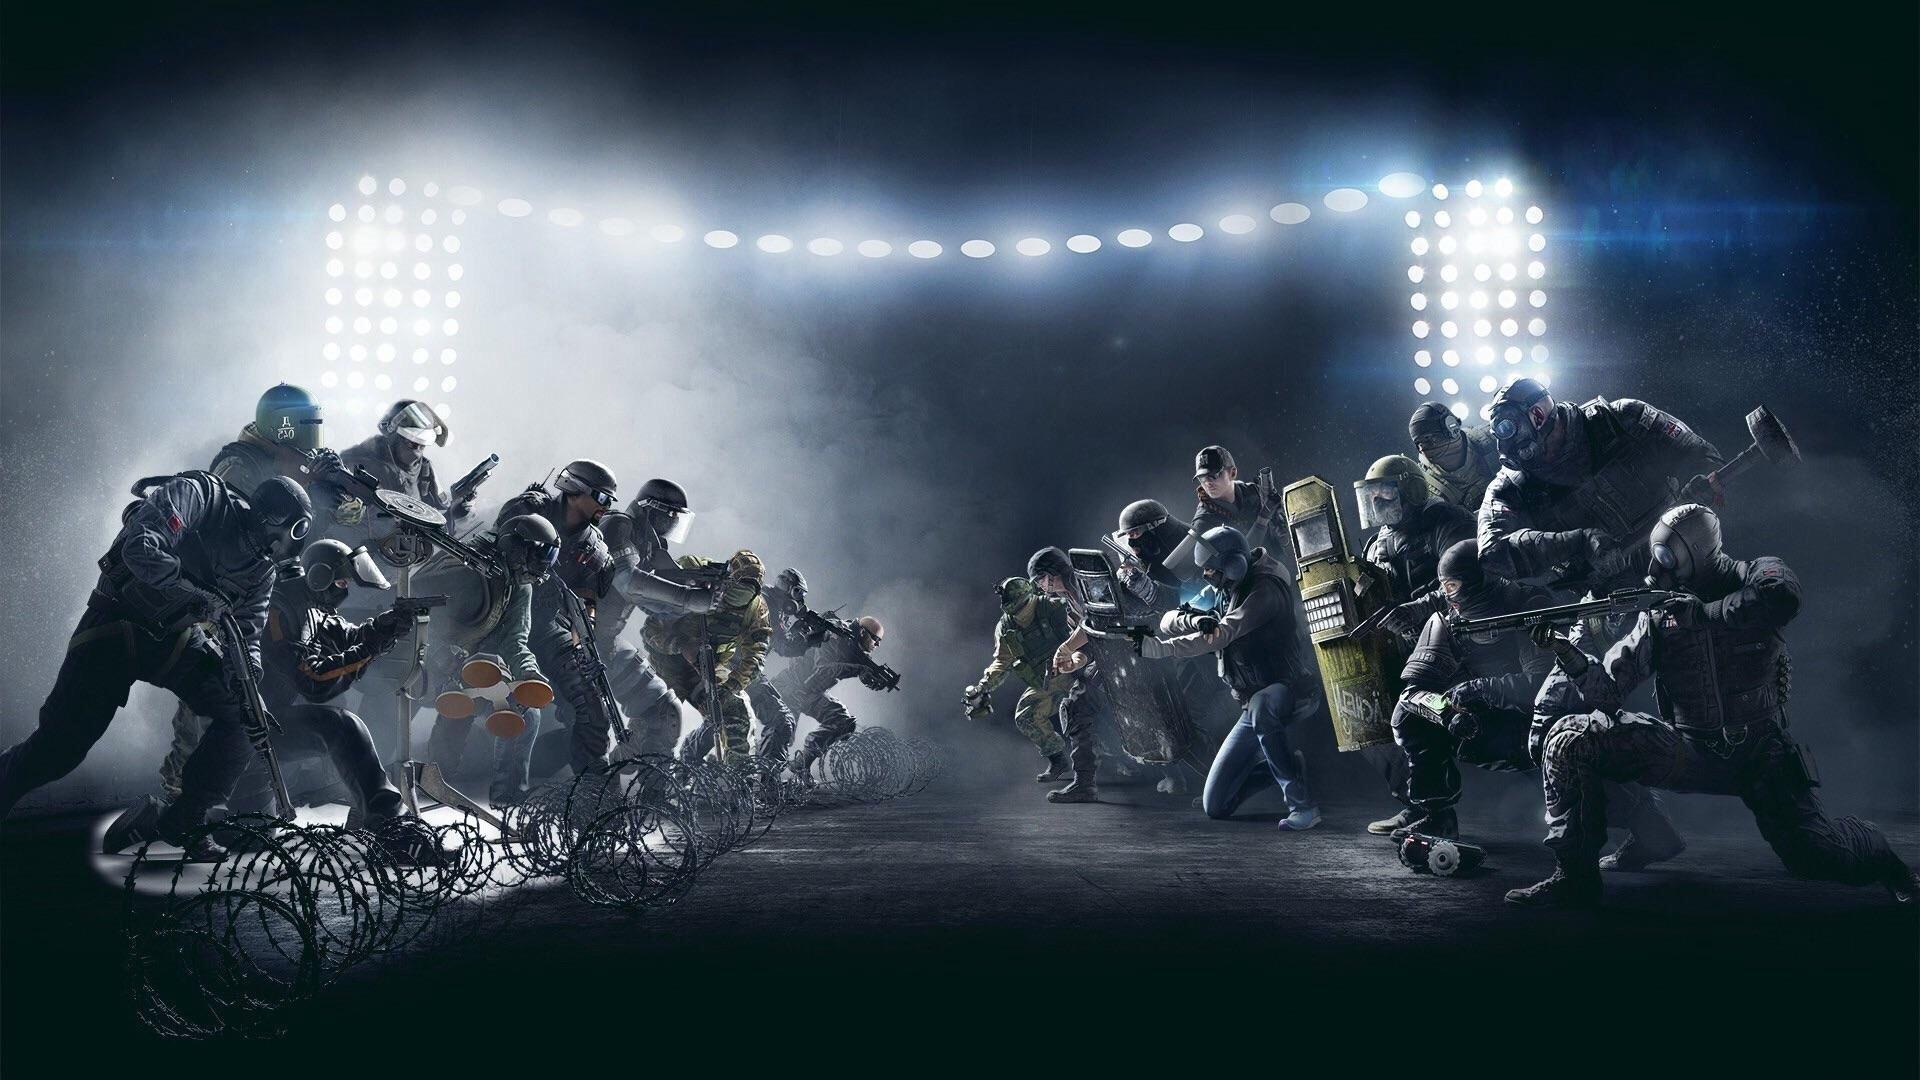 'Rainbow Six Siege': Ubisoft holding free weekend beginning August 24